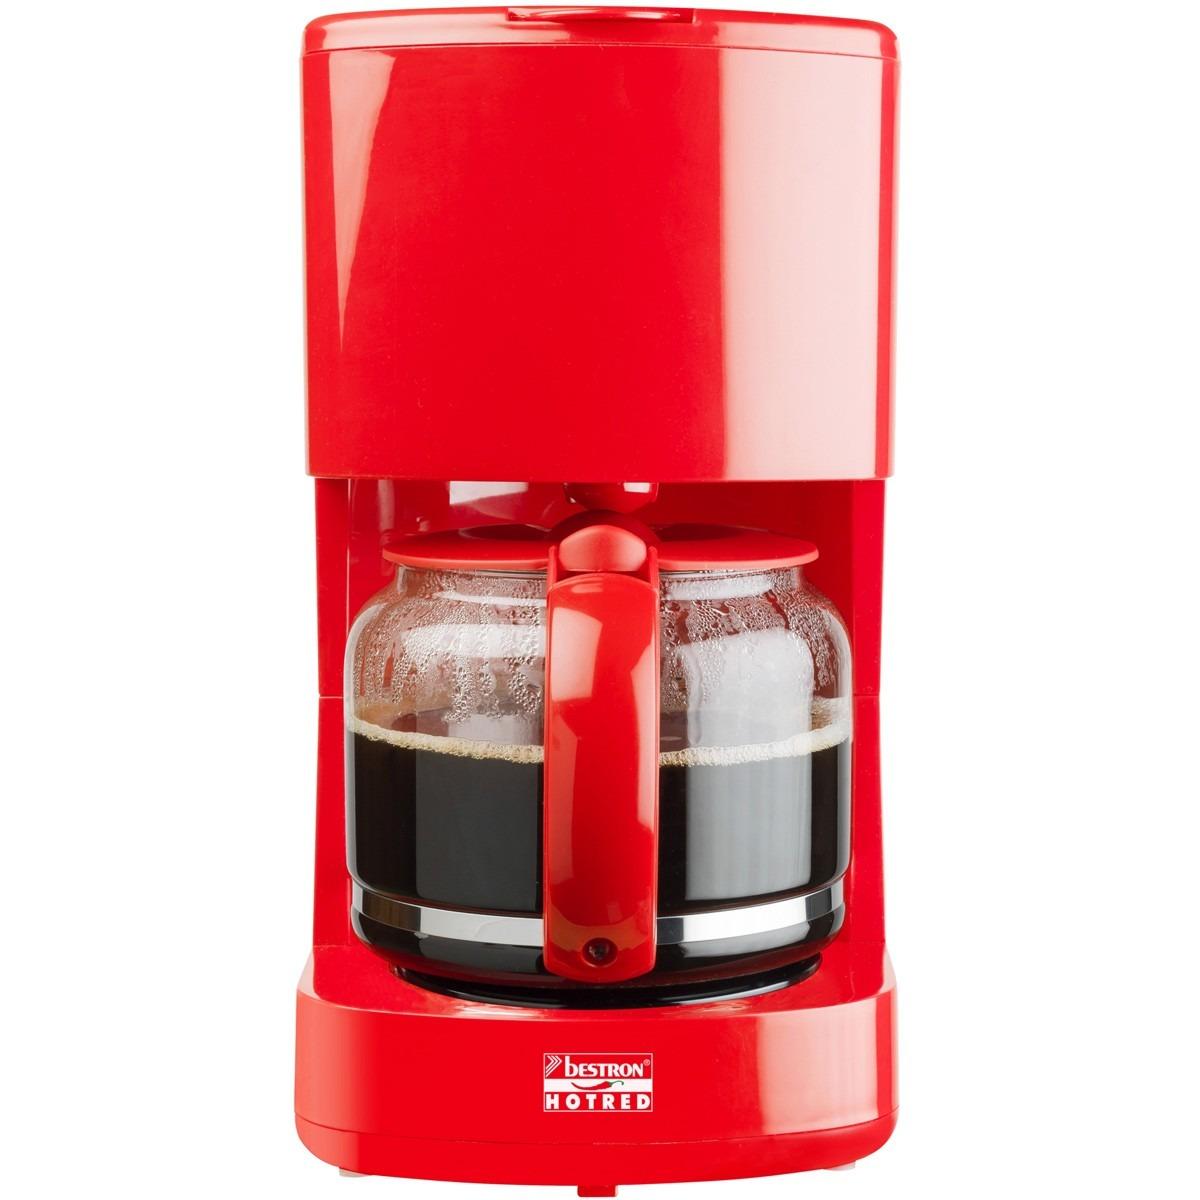 Bestron koffiefilter apparaat ACM300HR